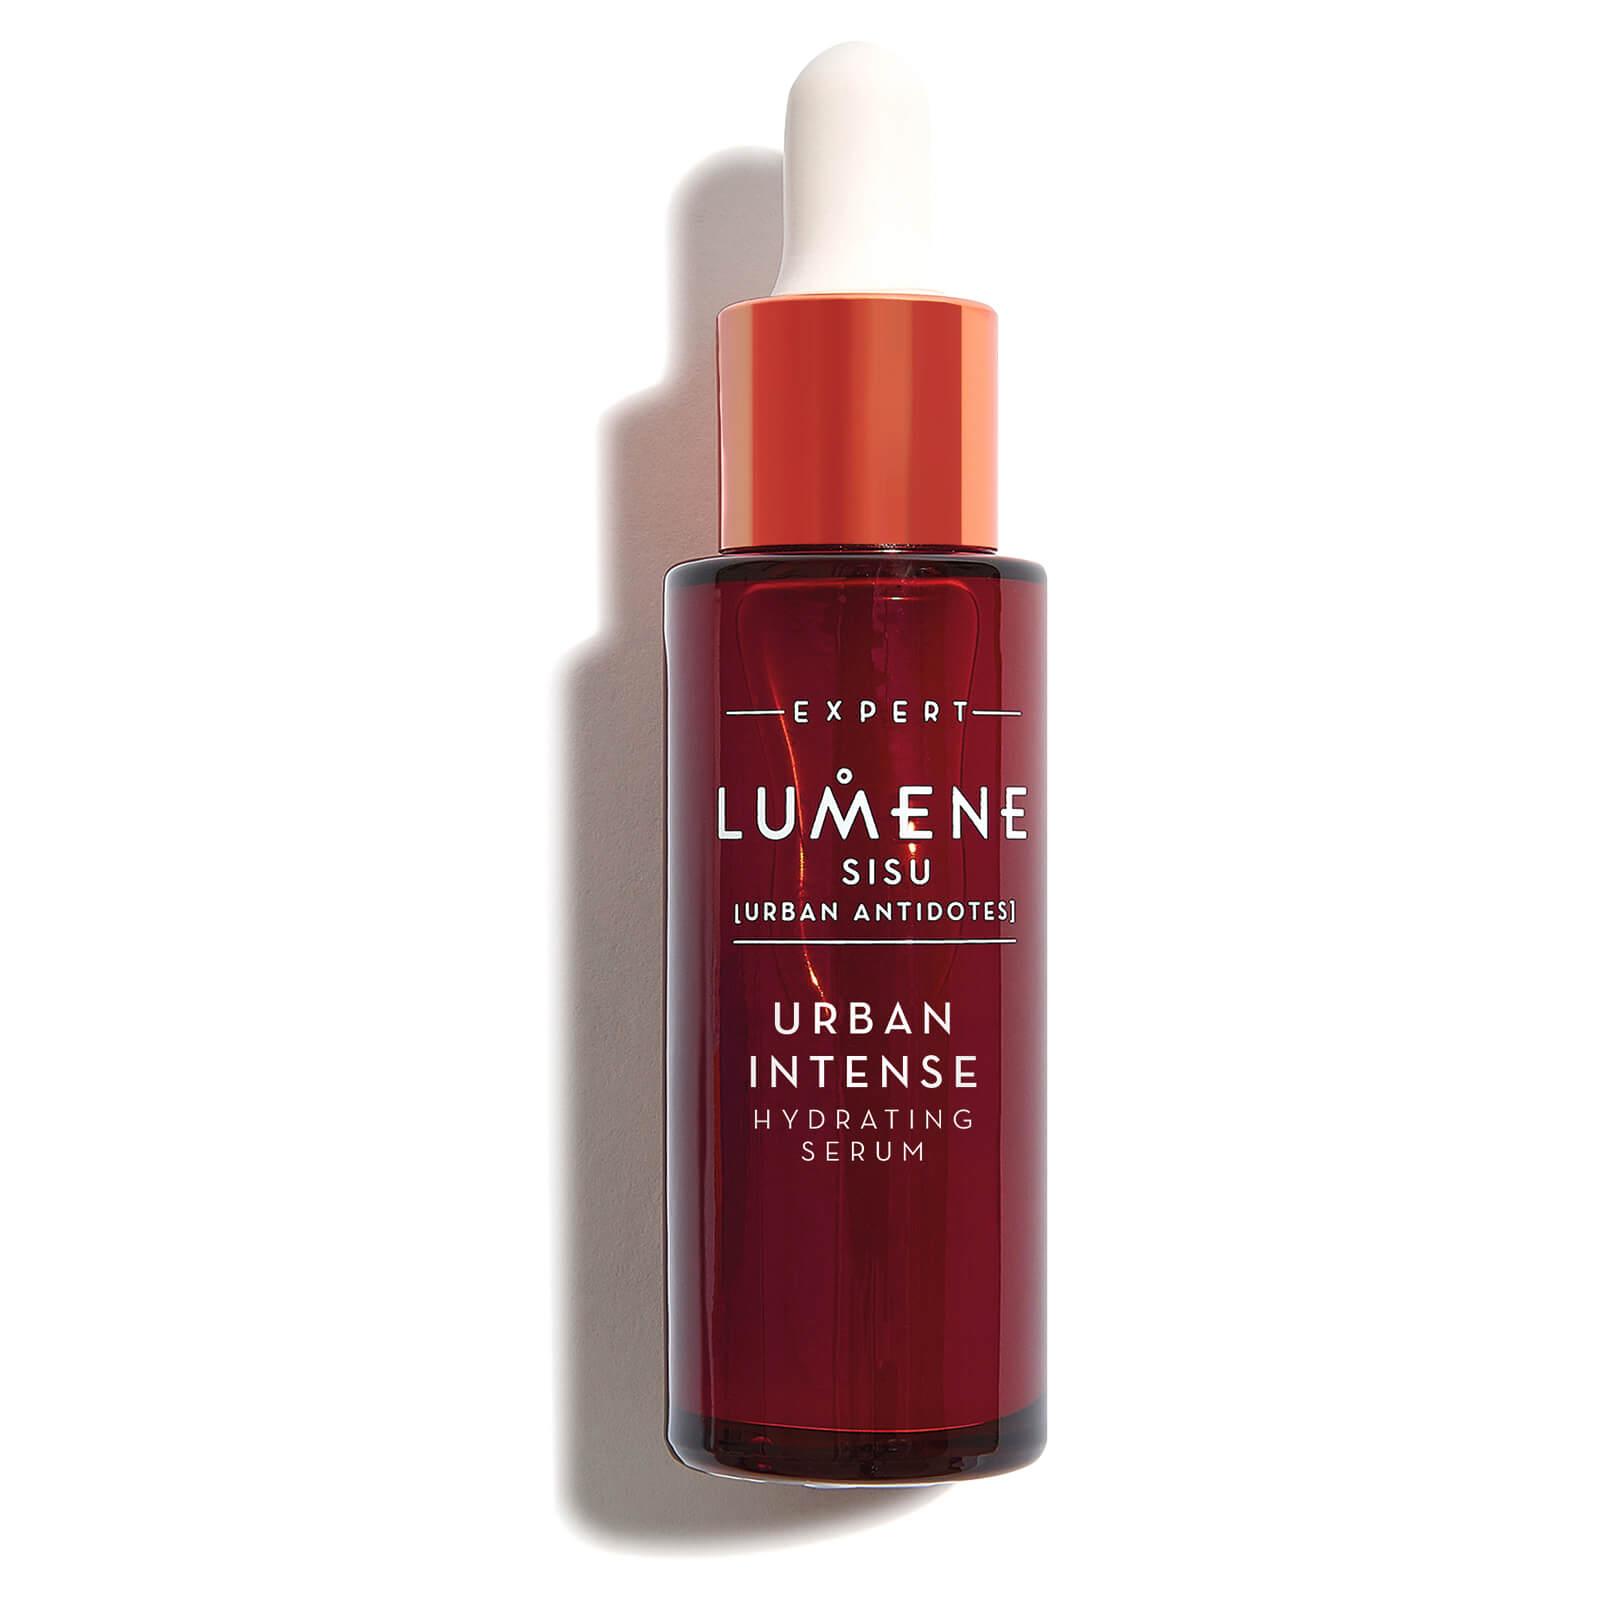 Lumene Nordic Detox [Sisu] Urban Intense Hydrating Serum